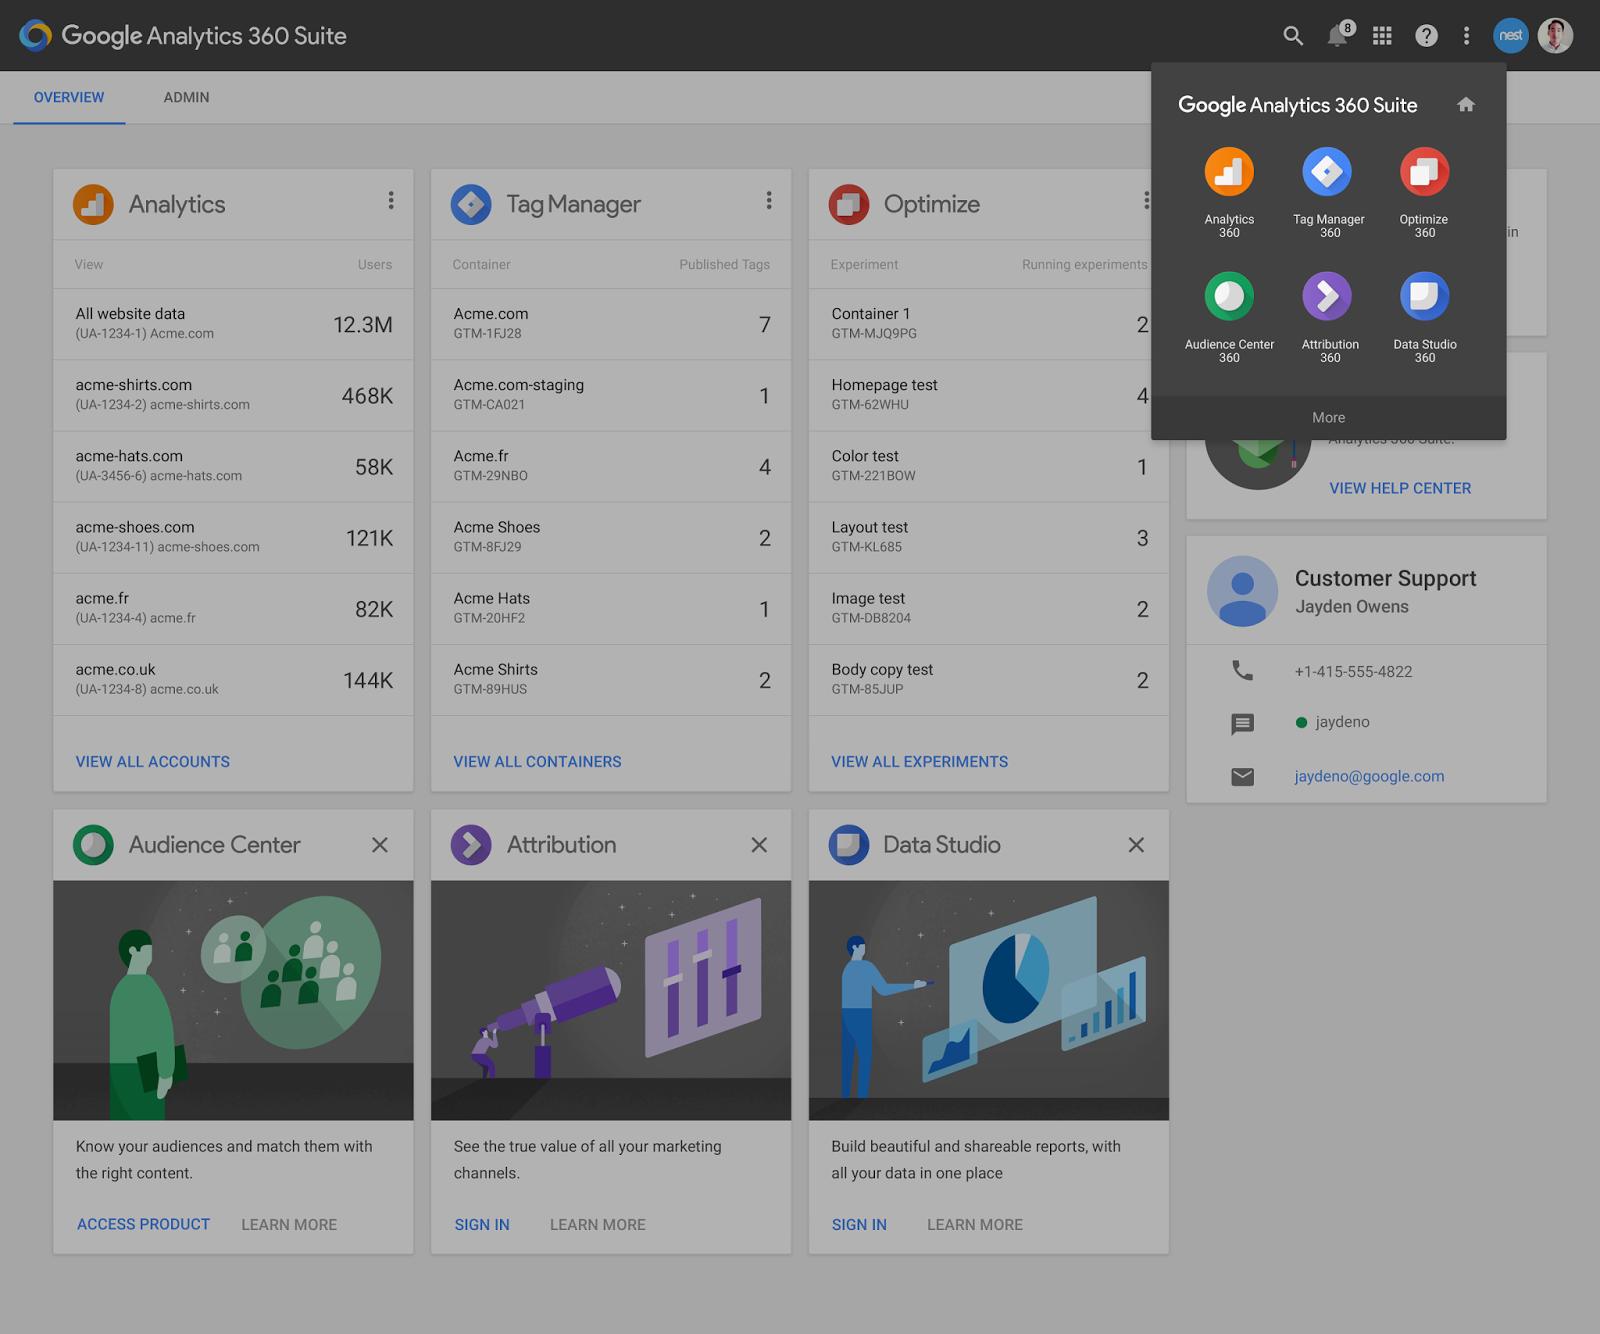 google-analytics-360-suite.png